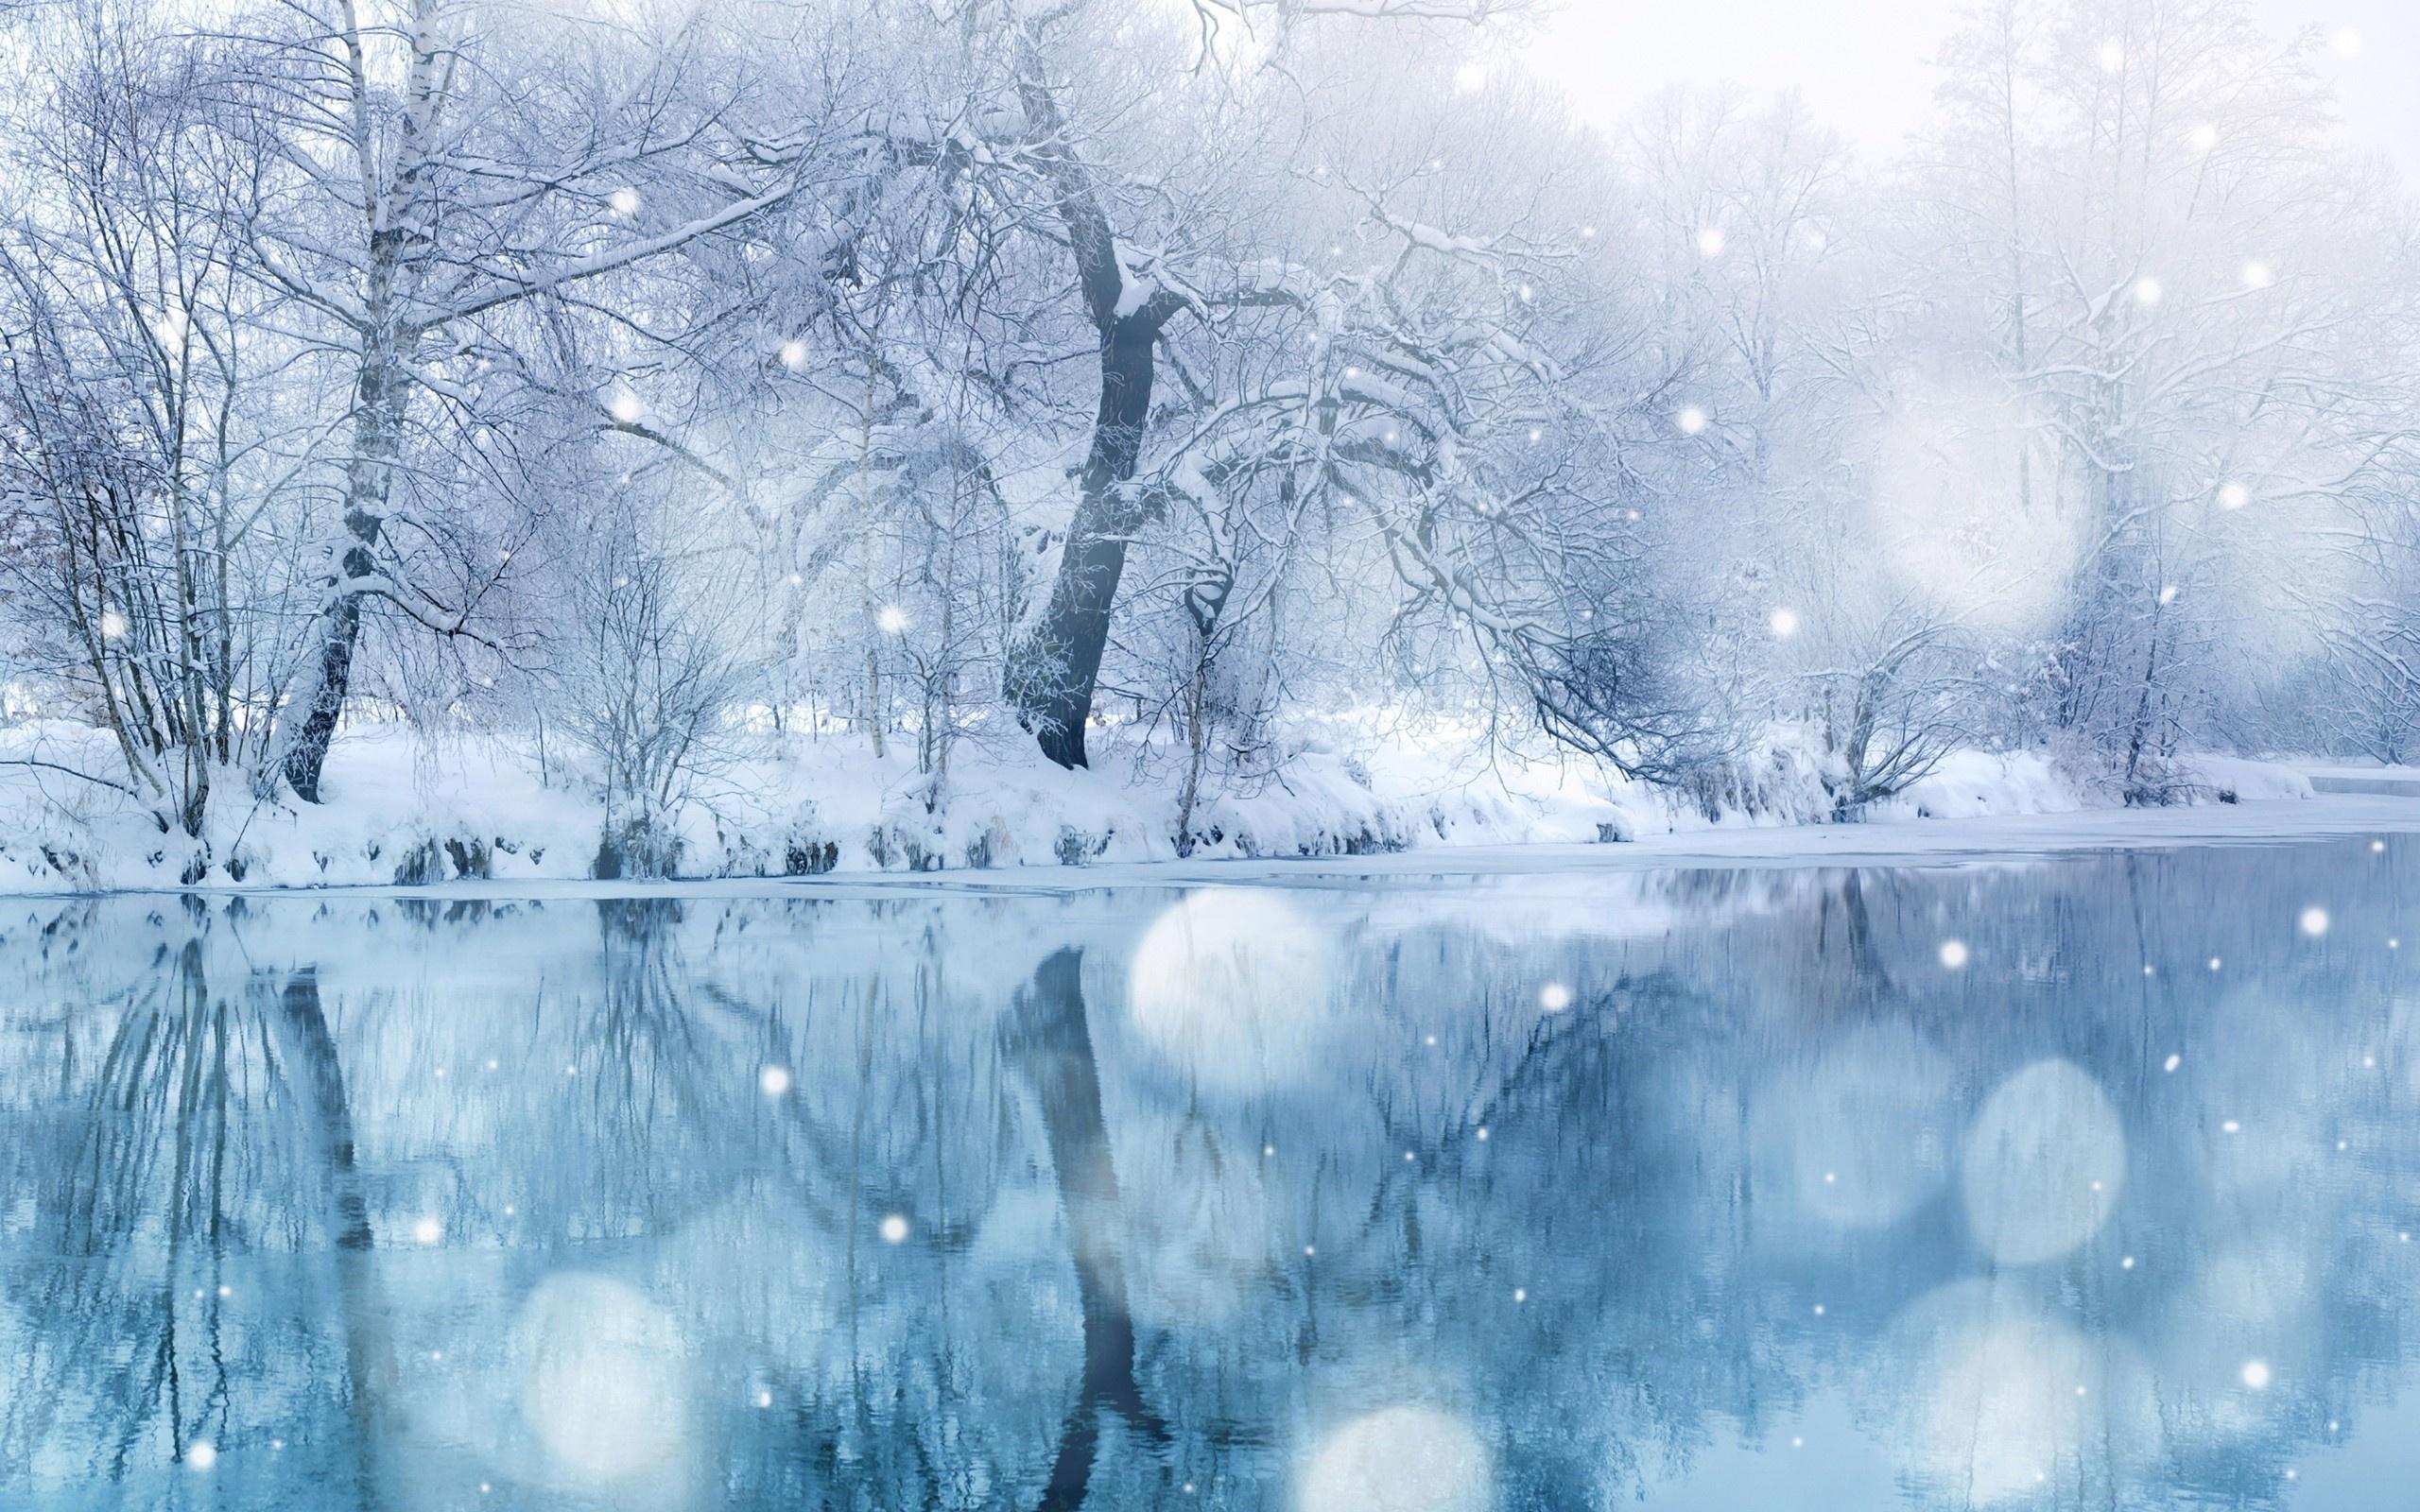 https://www.zastavki.com/pictures/originals/2013/Winter_Winter_forest_near_the_river_053912_.jpg